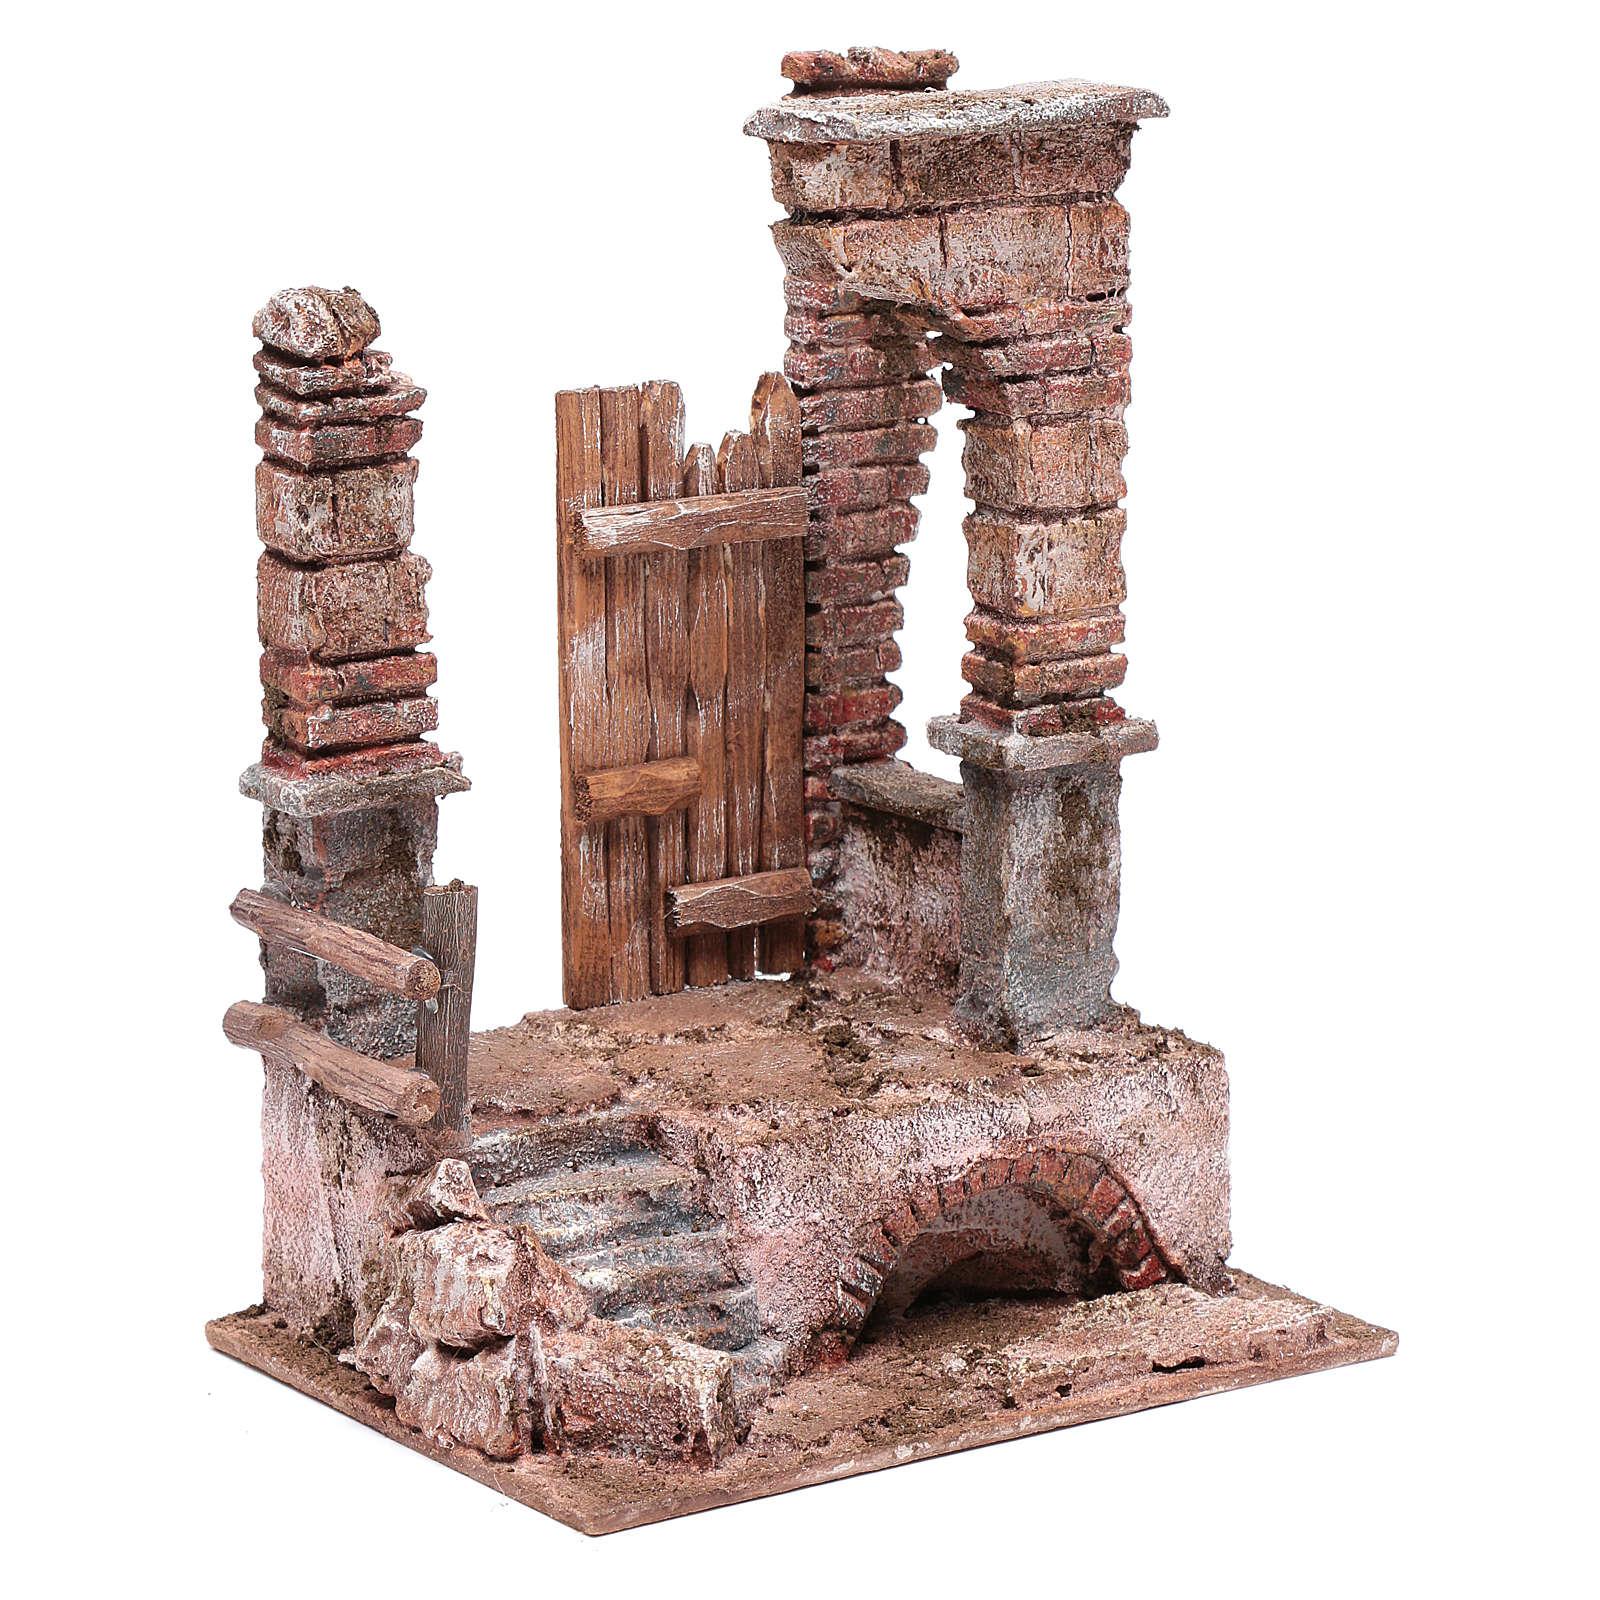 Templo con columnas de ladrillos 25x20x15 cm 4